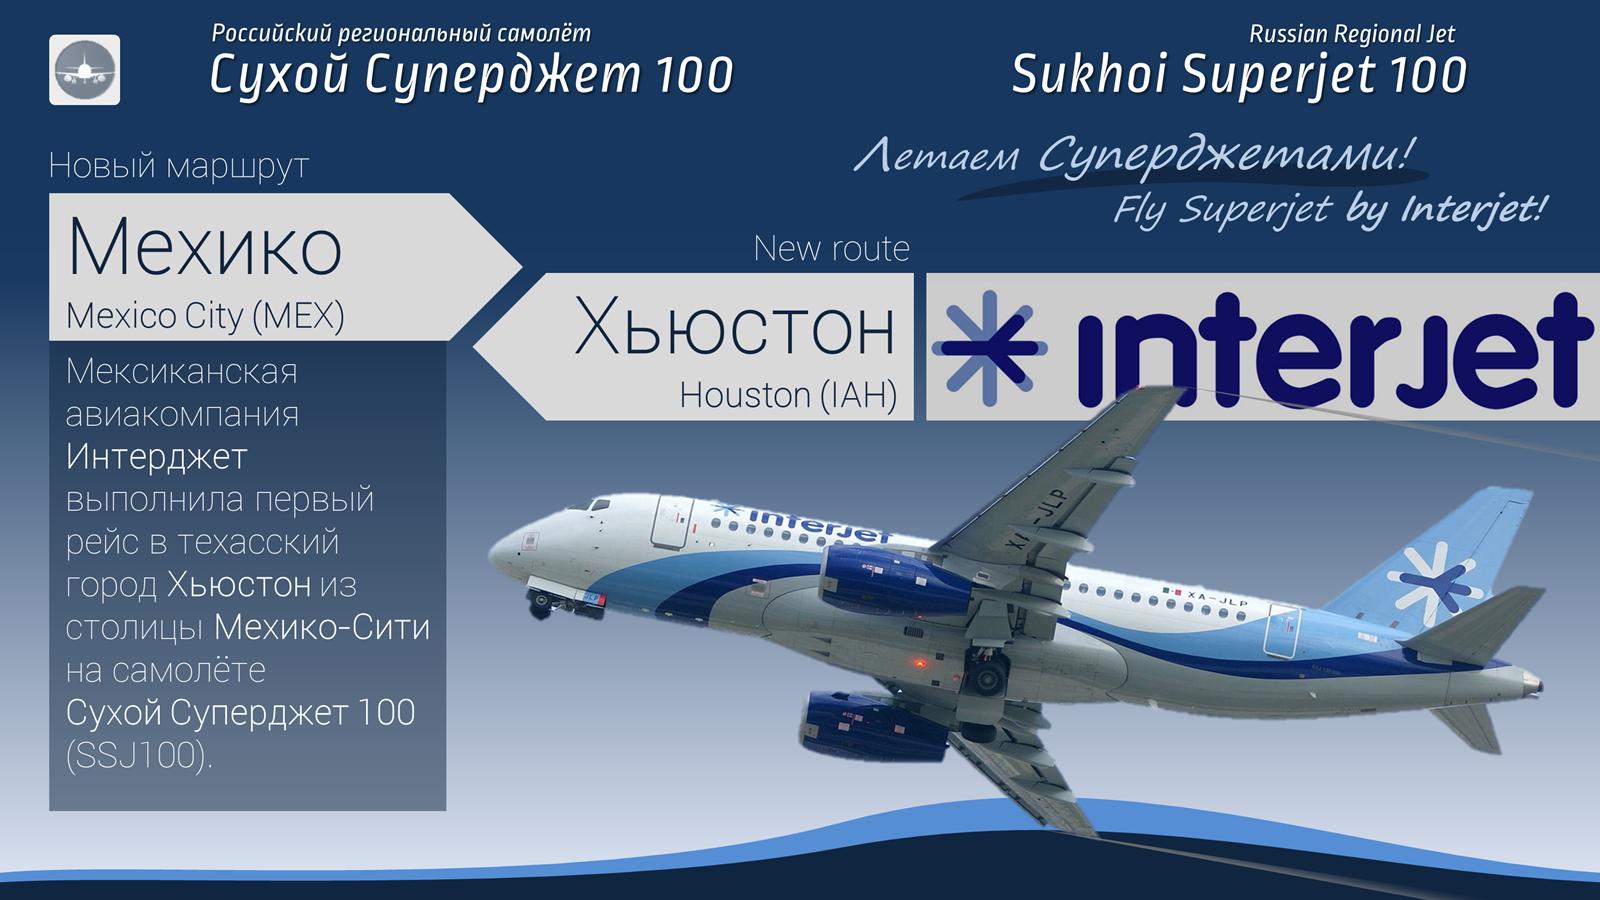 Sukhoi%20Superjet%20SSJ100%20russian%20aircraft%20interjet.png